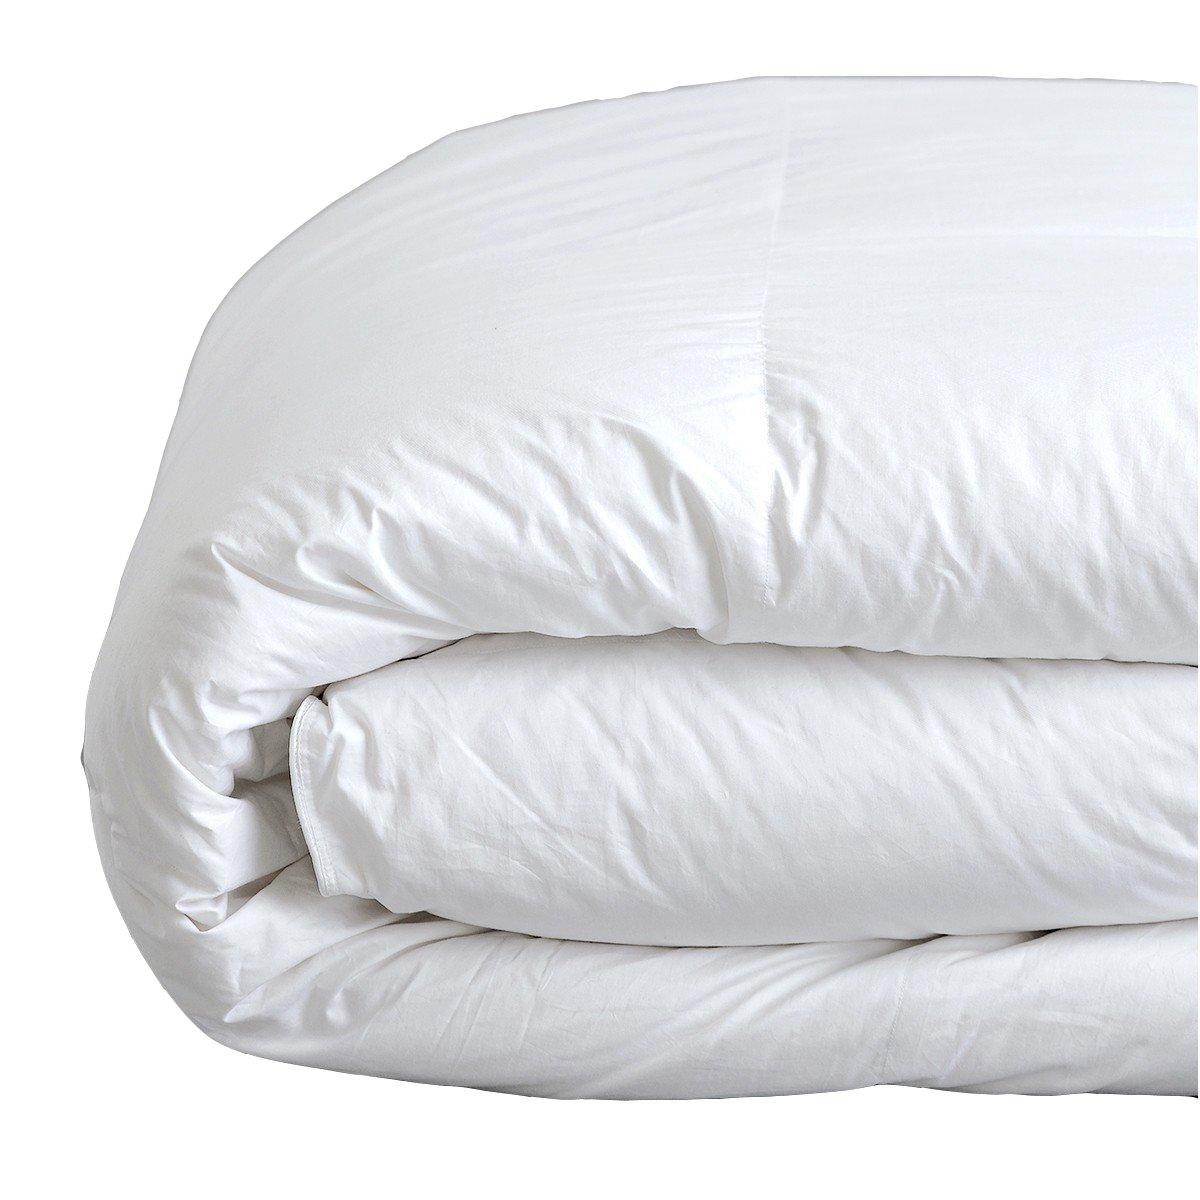 CDM product Down Under Filled in Canada Jasper 850 Loft Hutterite White Goose Down Duvet Comforter Blanket Queen Size 30oz with Corner Ties big image